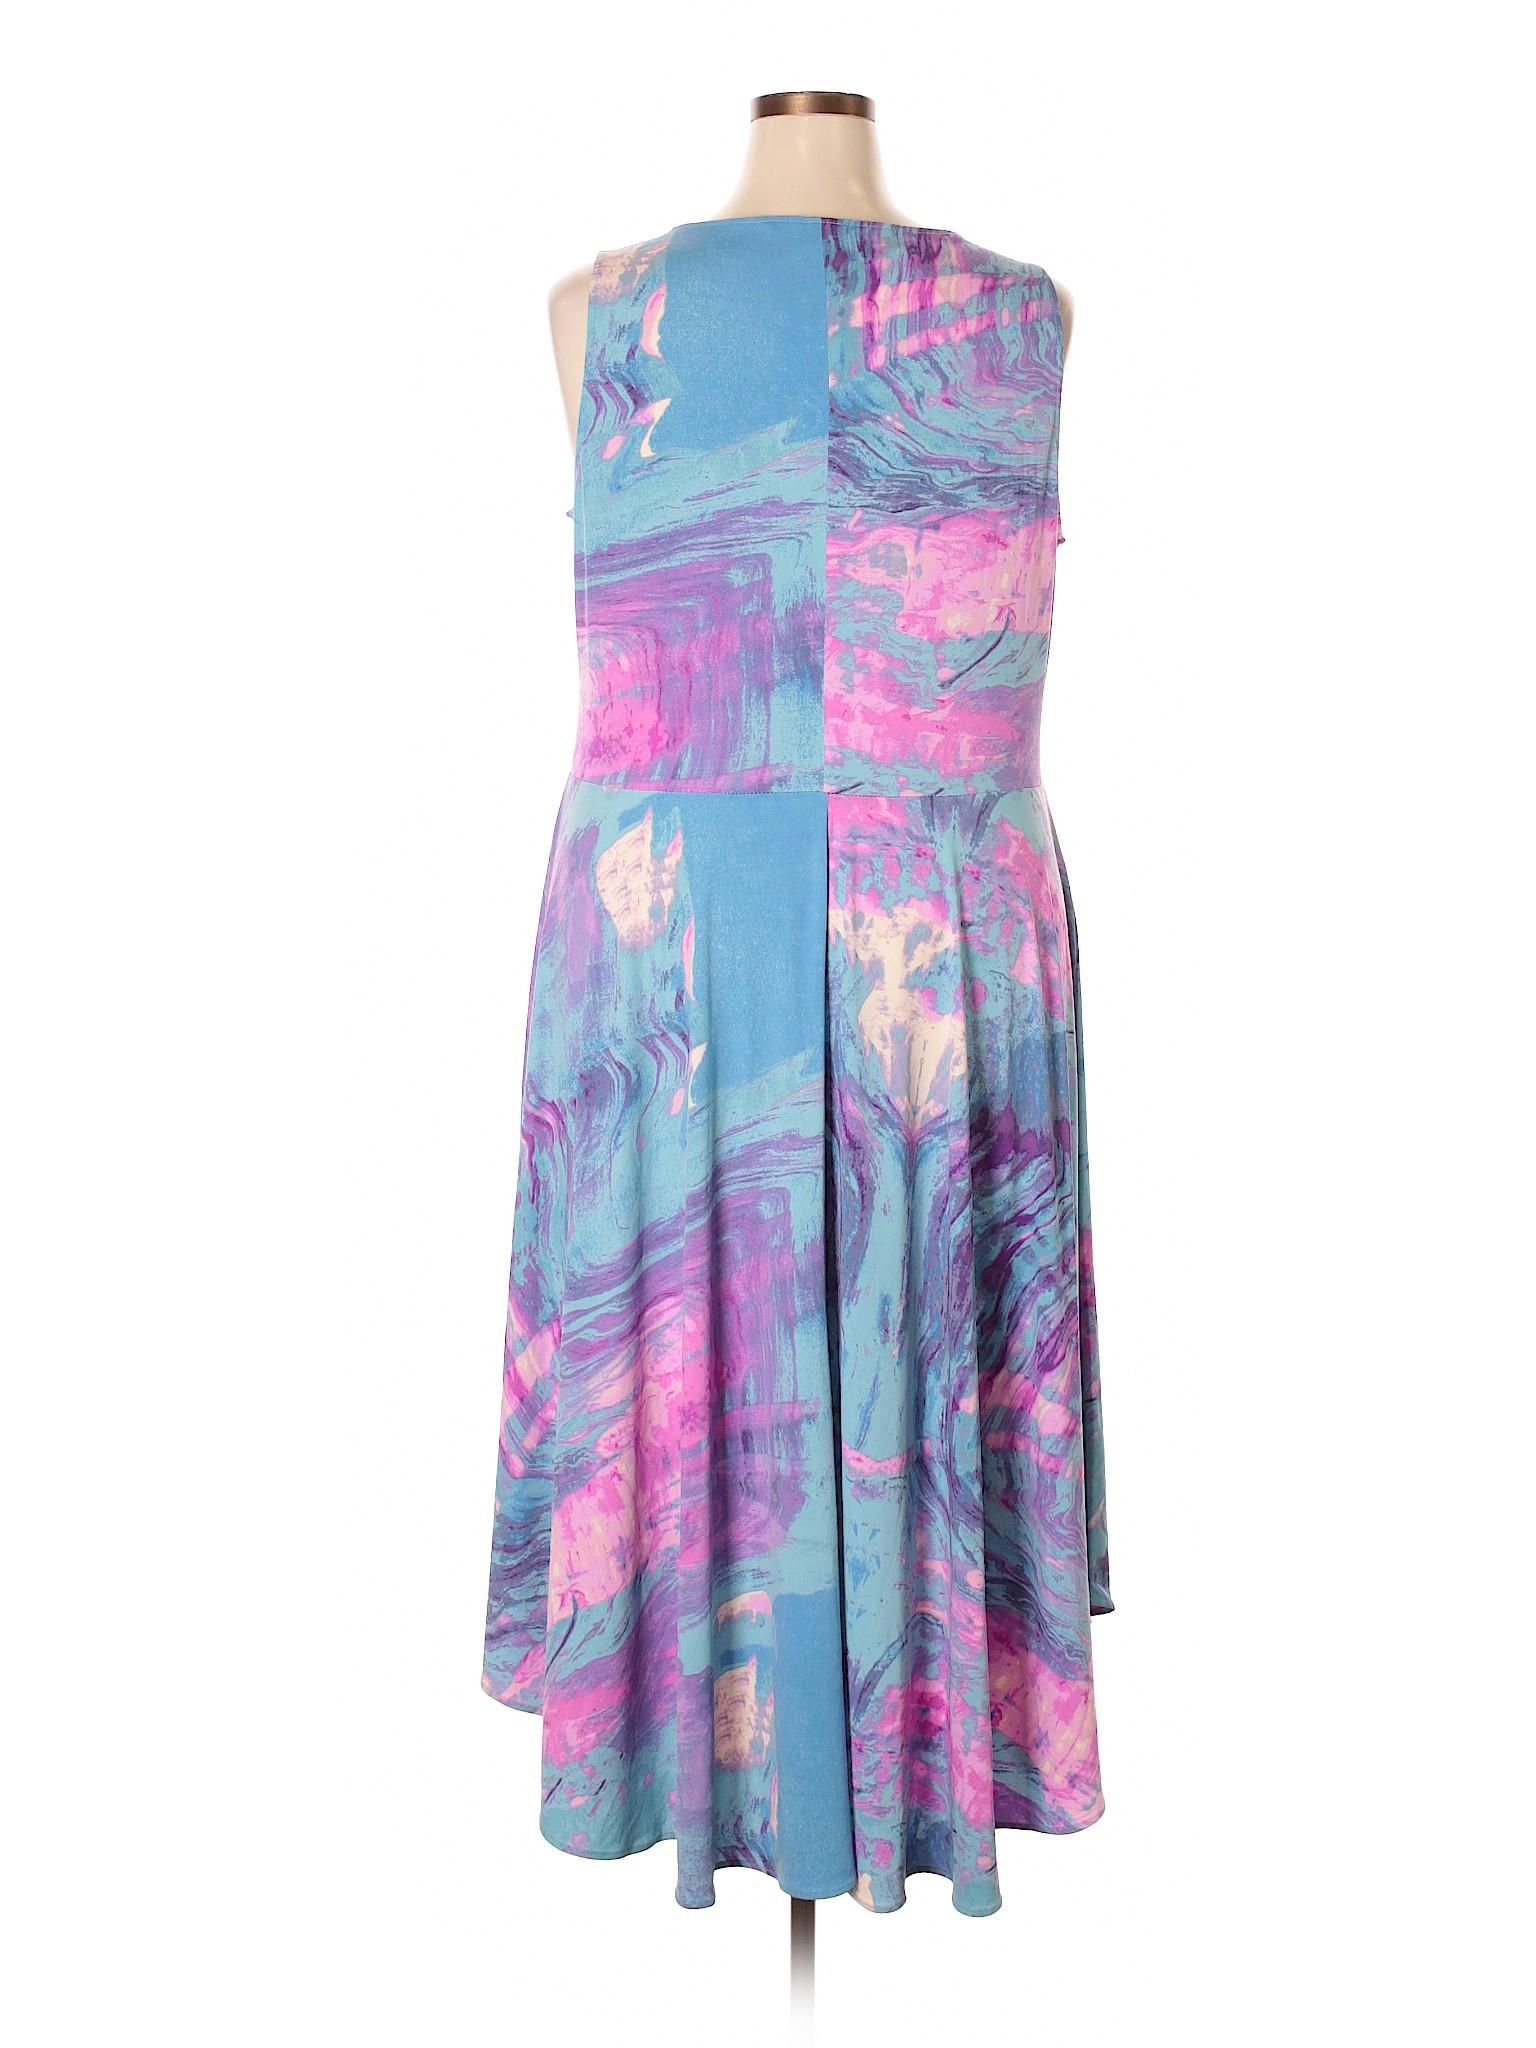 Dress Boutique RACHEL Casual Rachel Roy winter RqzqBwXM